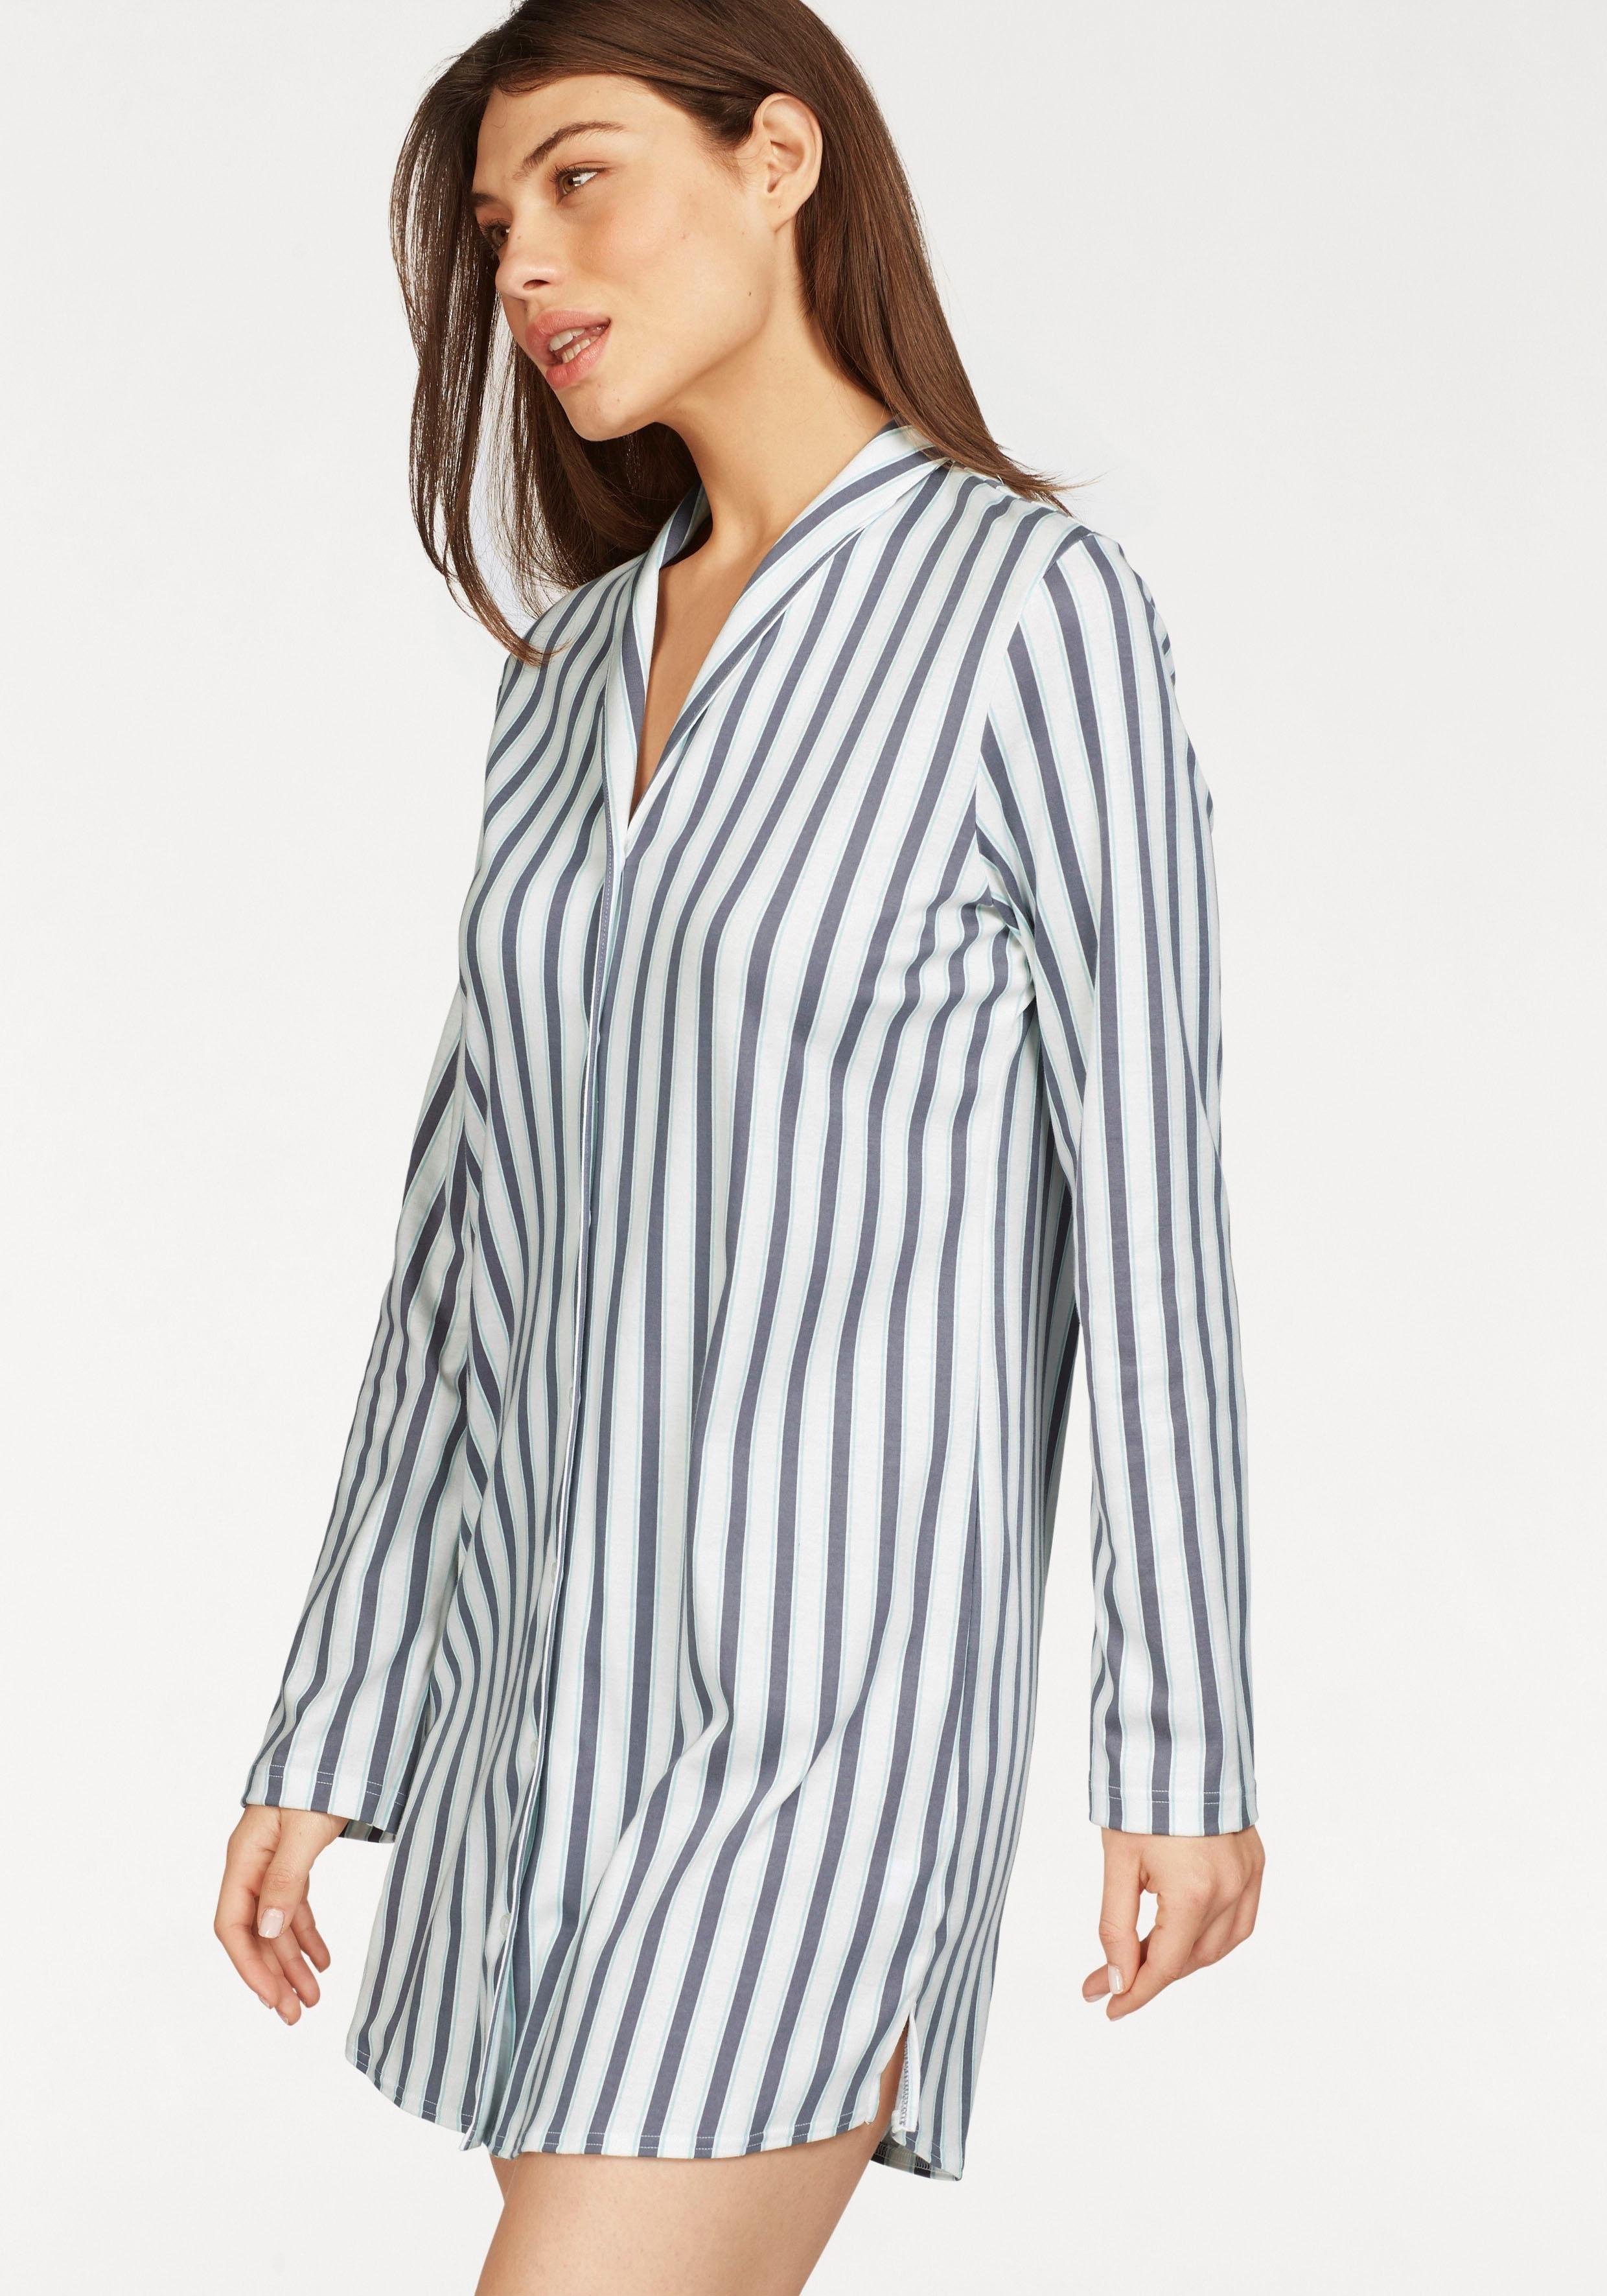 Calida nachthemd met streepdessin, bovenrand en kraag - verschillende betaalmethodes